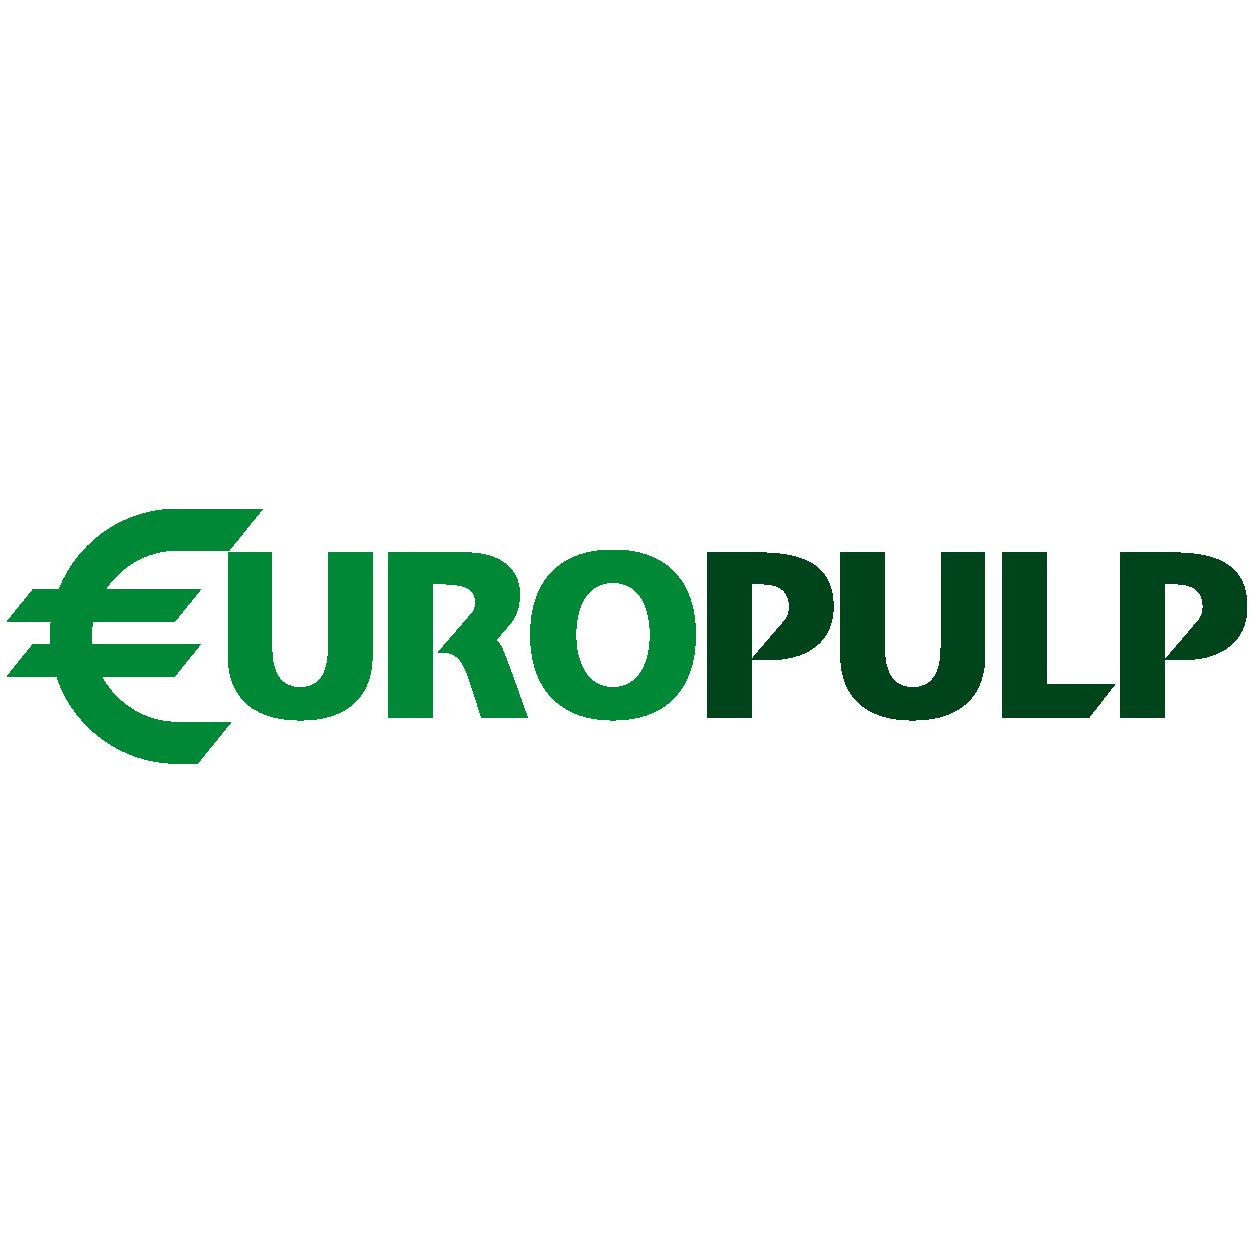 Europulp logo.jpg